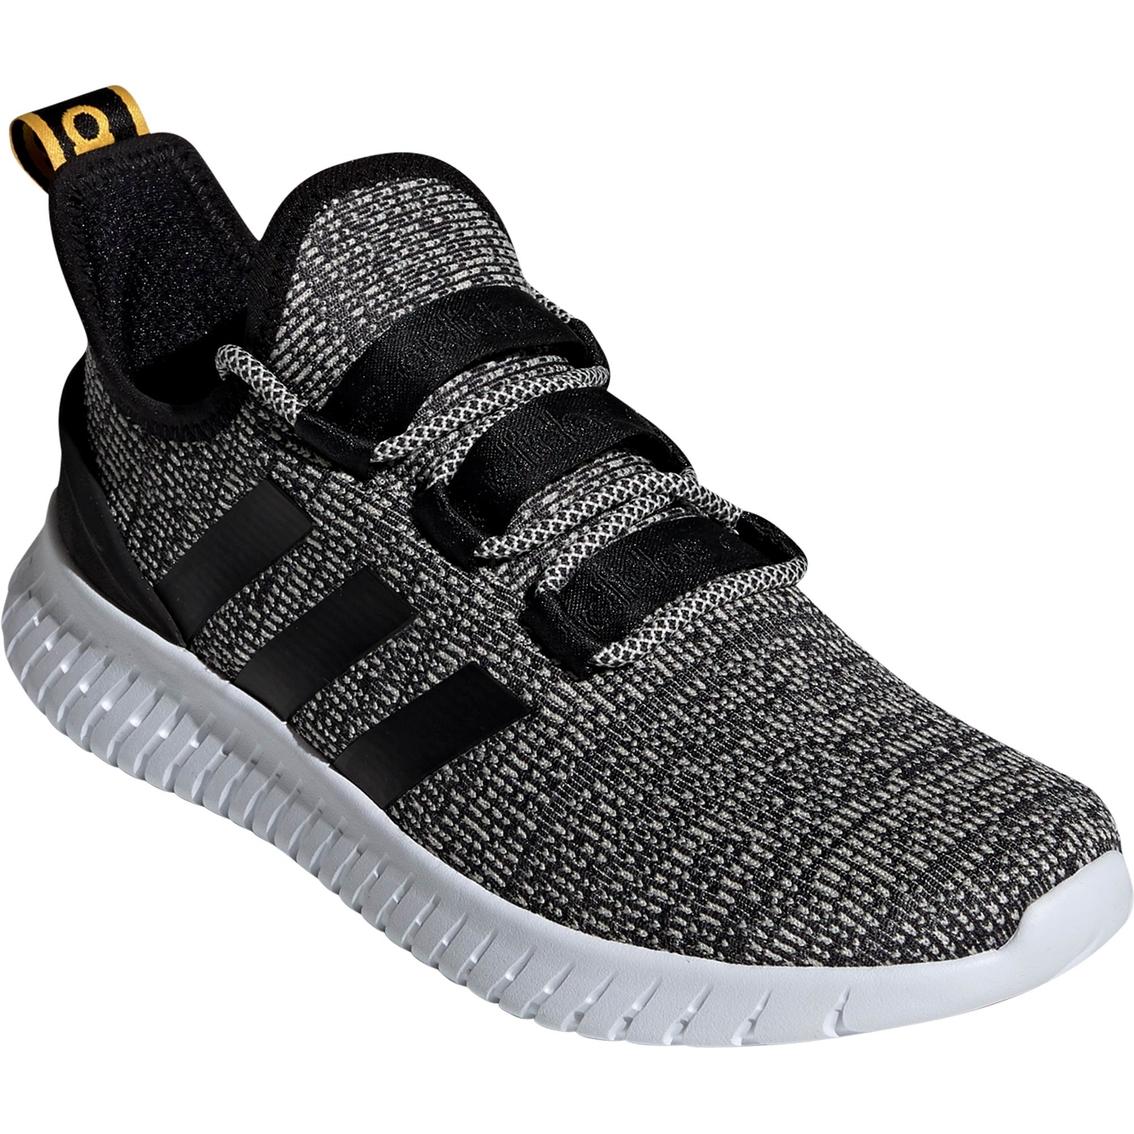 Adidas Men's Kaptir Running Shoes   Running   Shoes   Shop